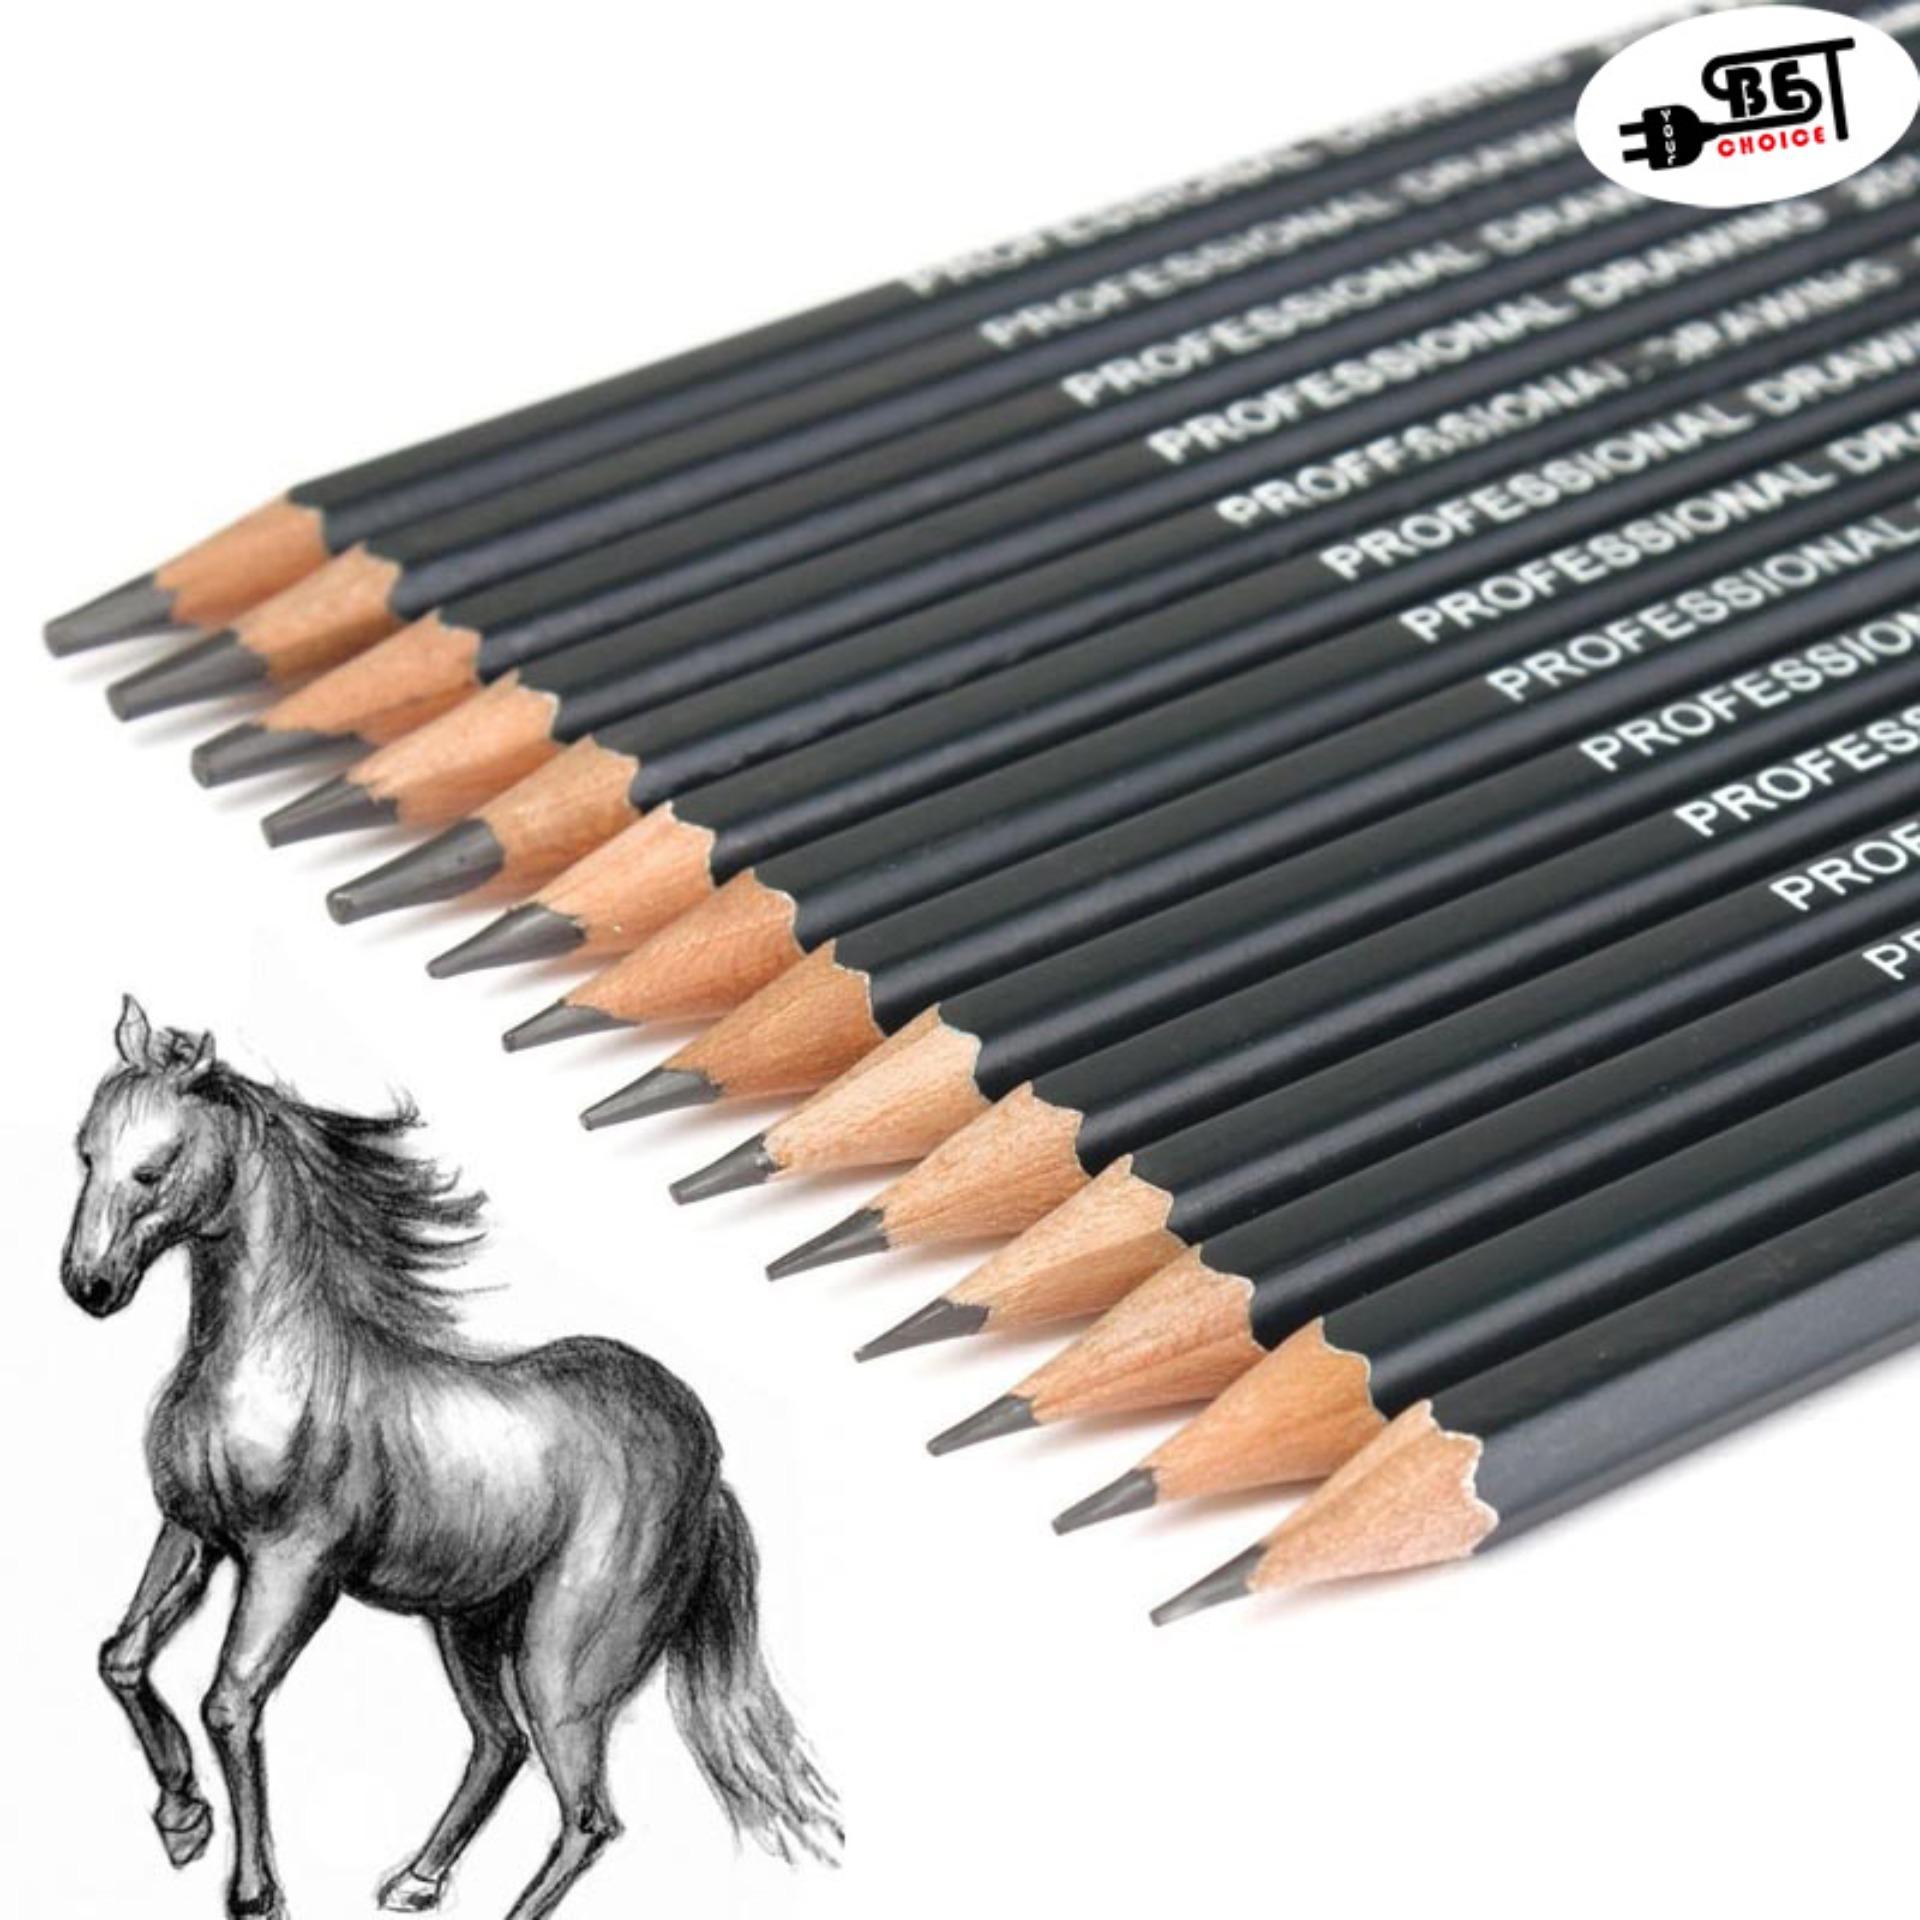 YBC 14pcs Professinal Sketch Art Drawing Pencil 6H-12B Sketching Pencils - intl